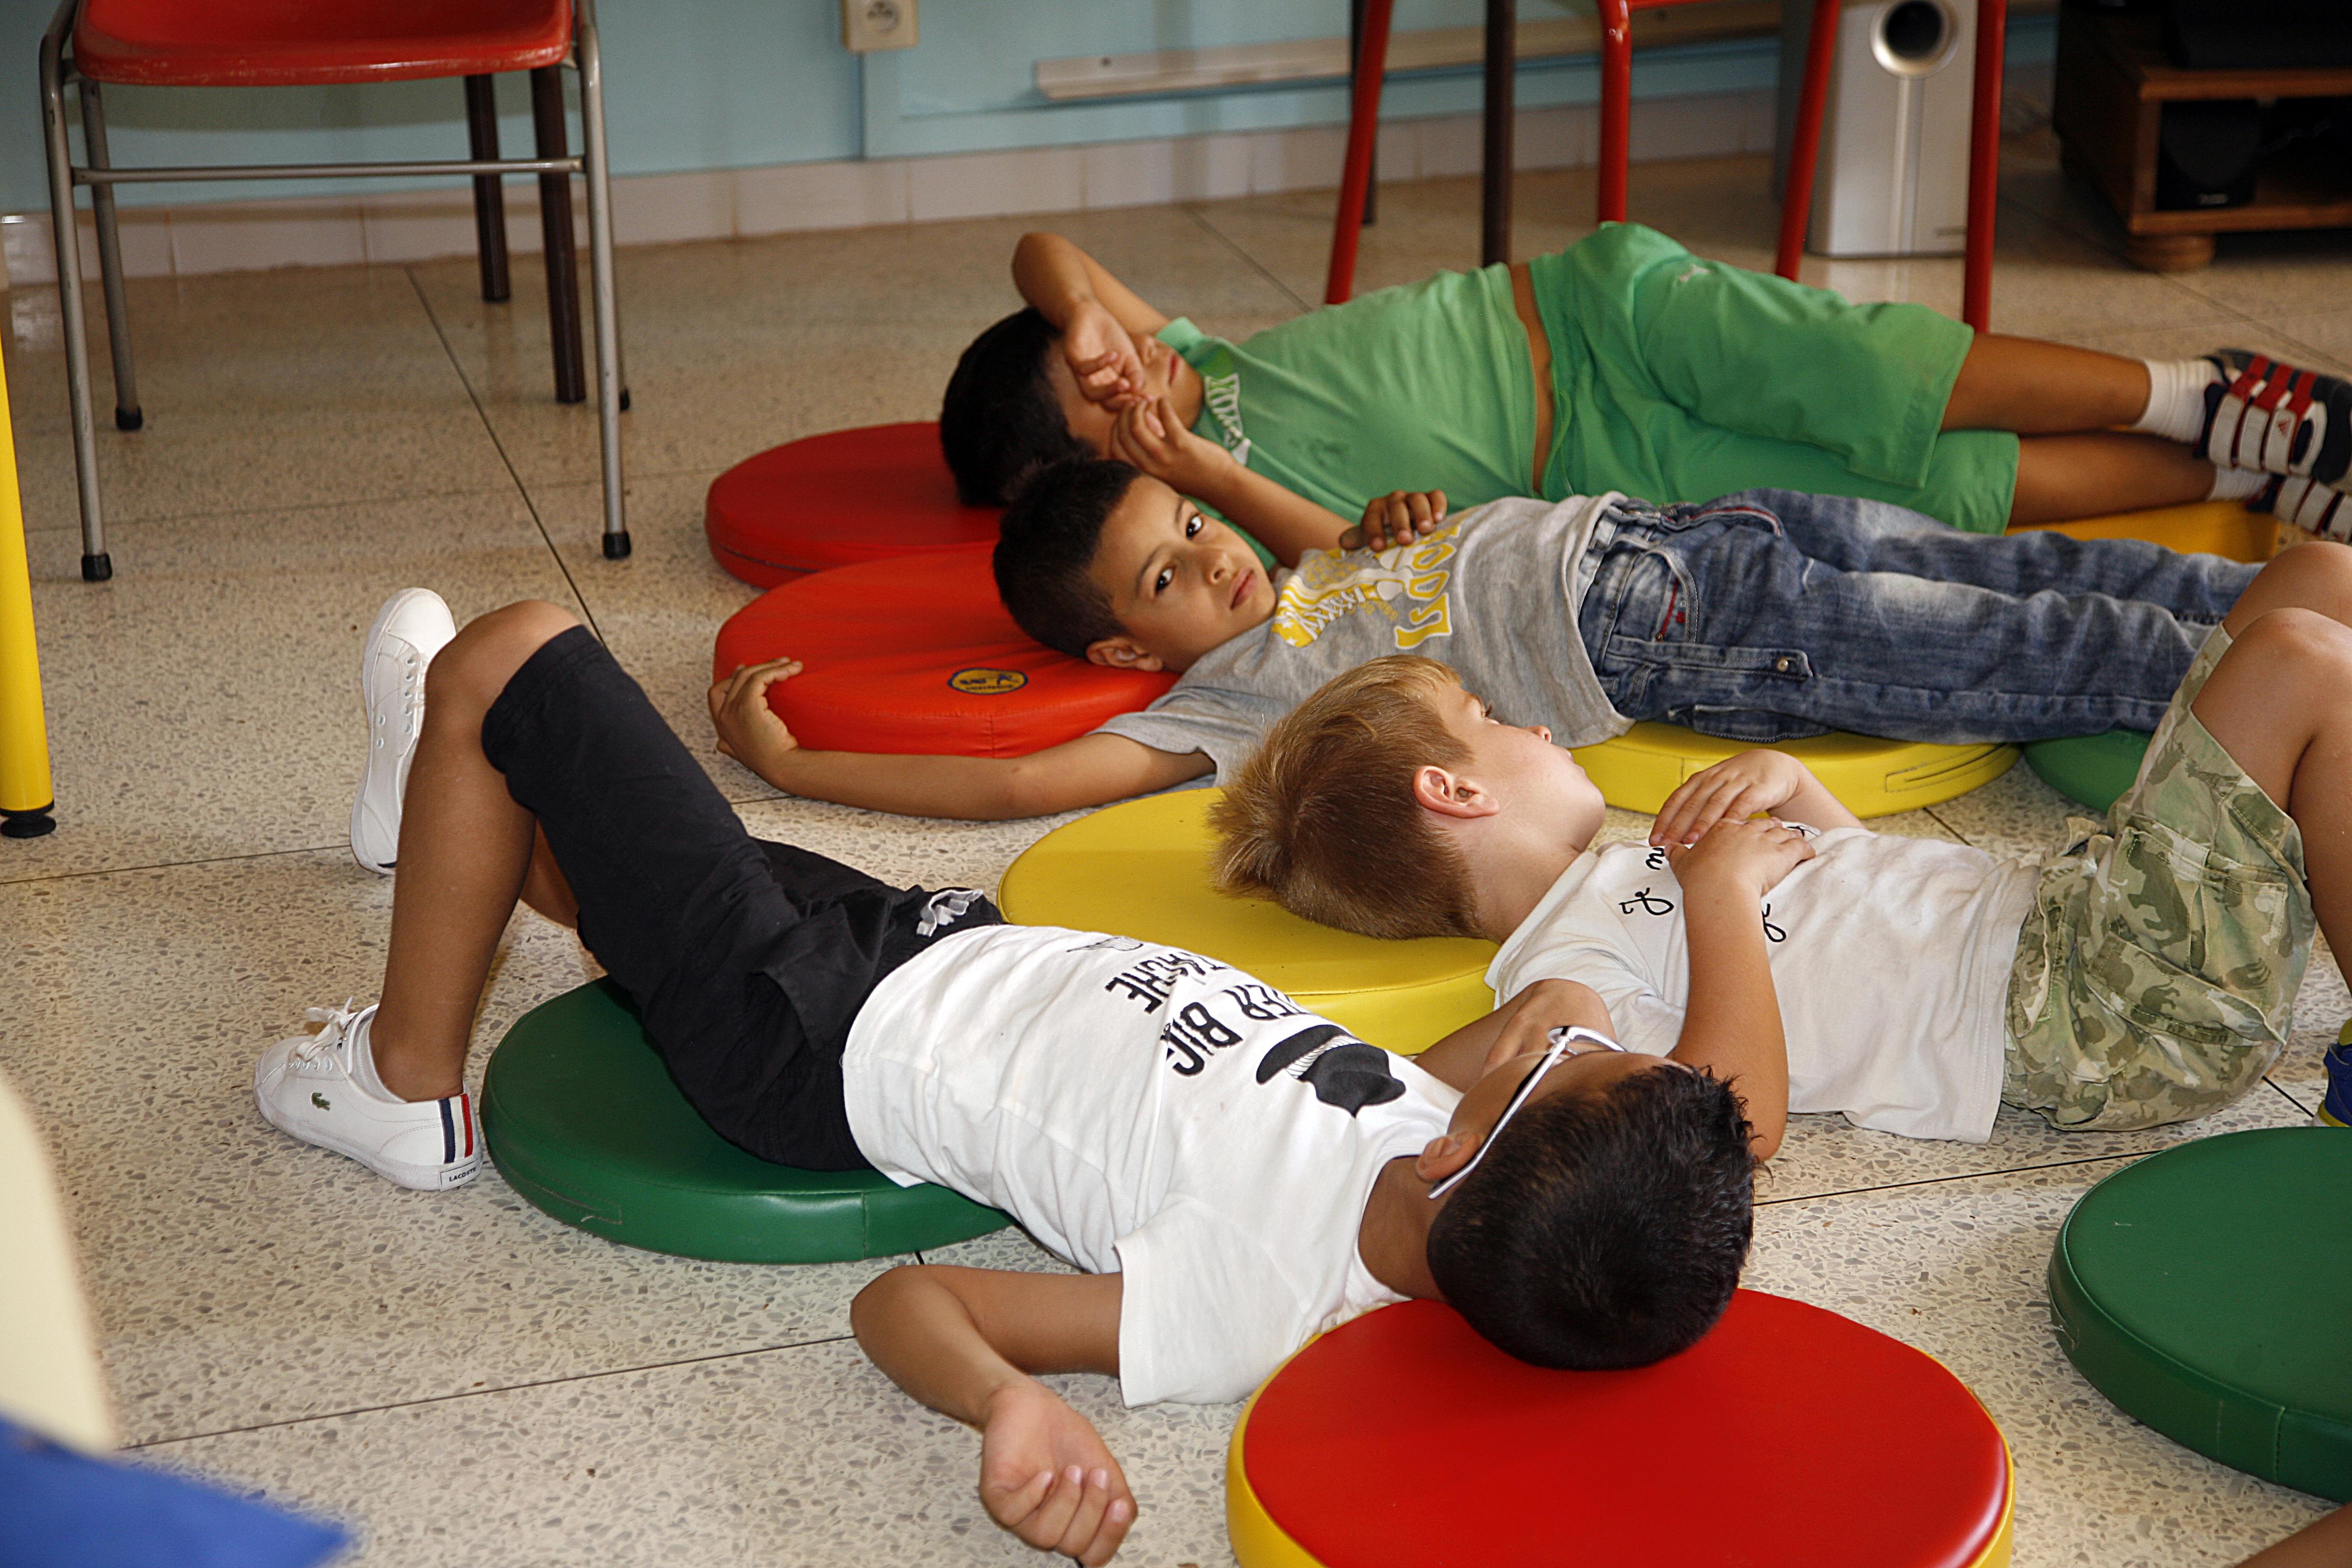 gilets jaunes 13 contre la r forme des rythmes scolaires juillet 2015. Black Bedroom Furniture Sets. Home Design Ideas